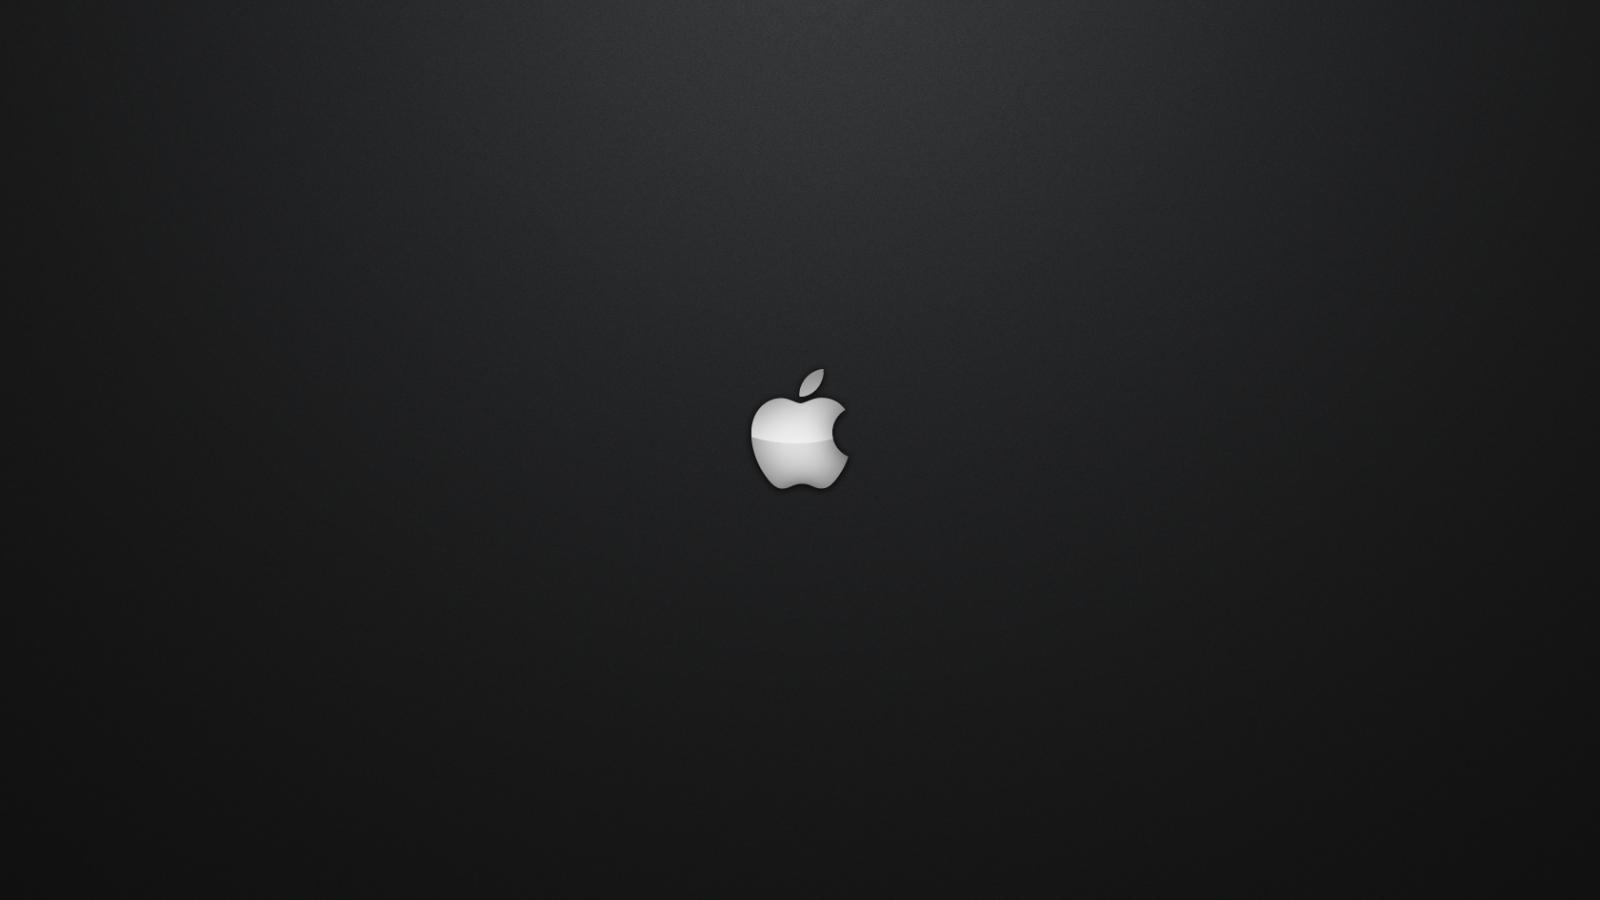 Free Download Black Cool Apple Mac Wallpaper Best 1816